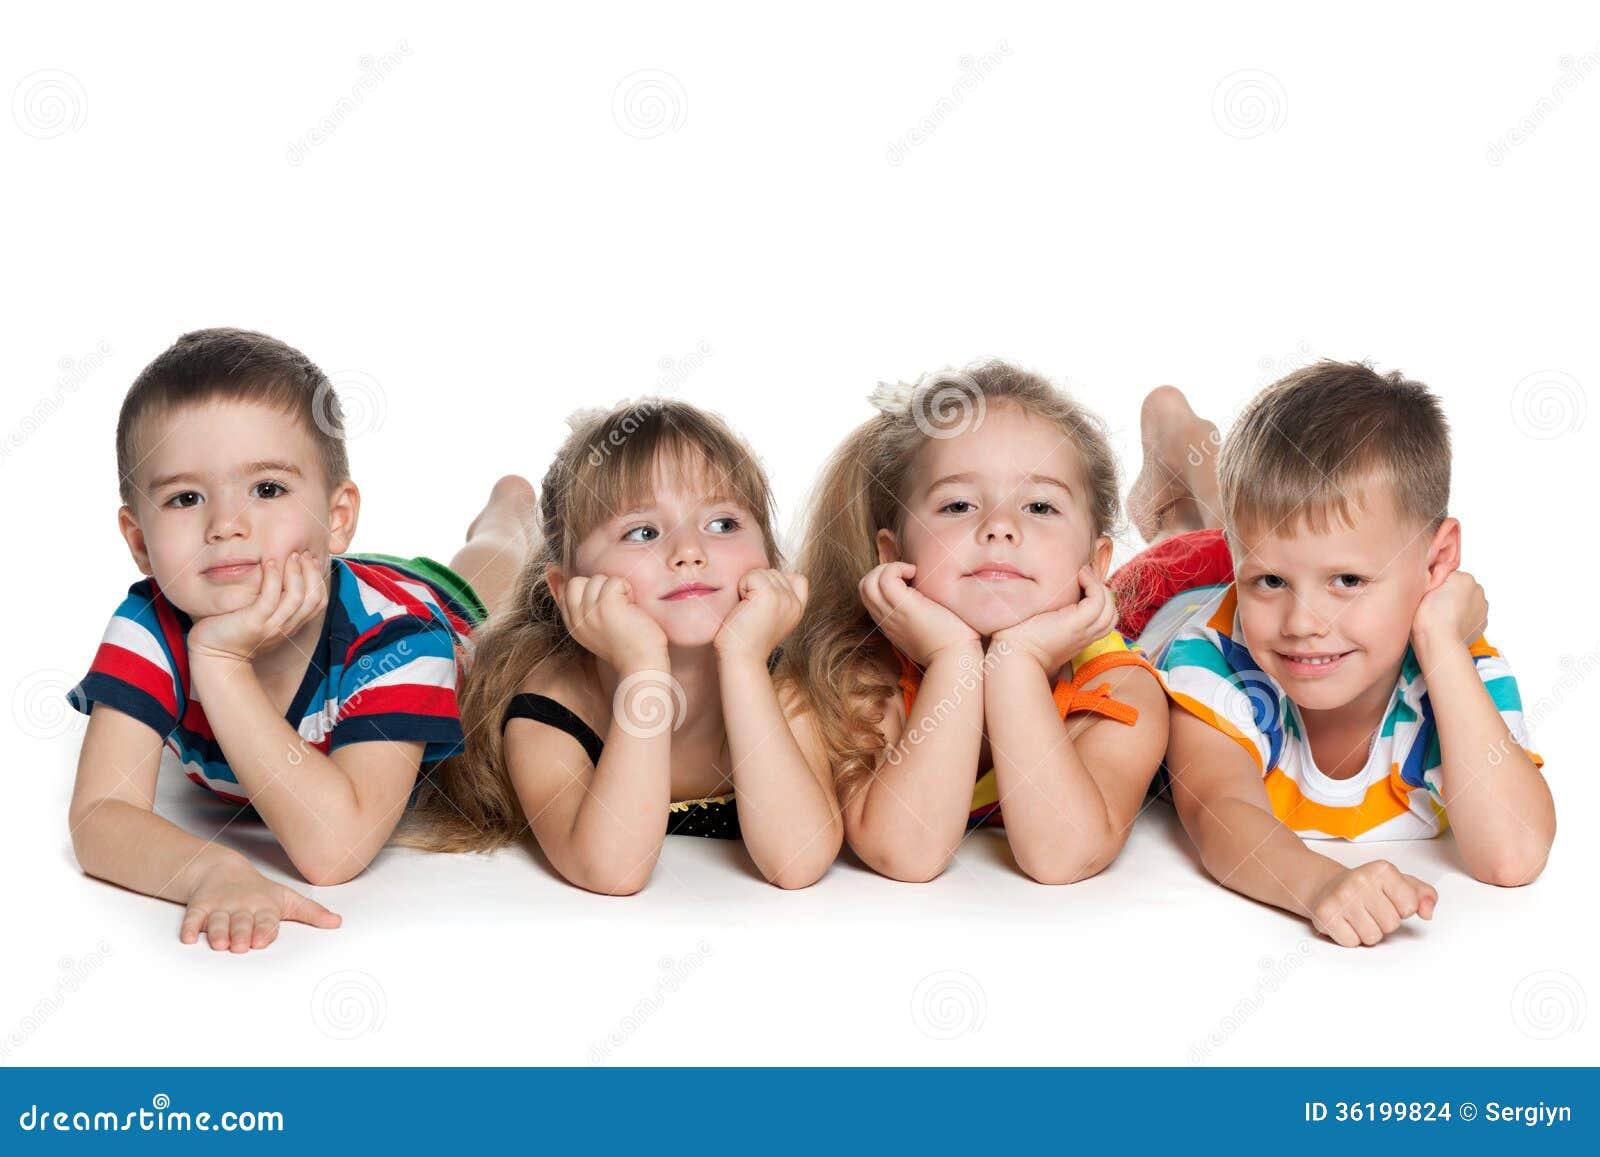 four preschool children on the floor stock images image 36199824. Black Bedroom Furniture Sets. Home Design Ideas